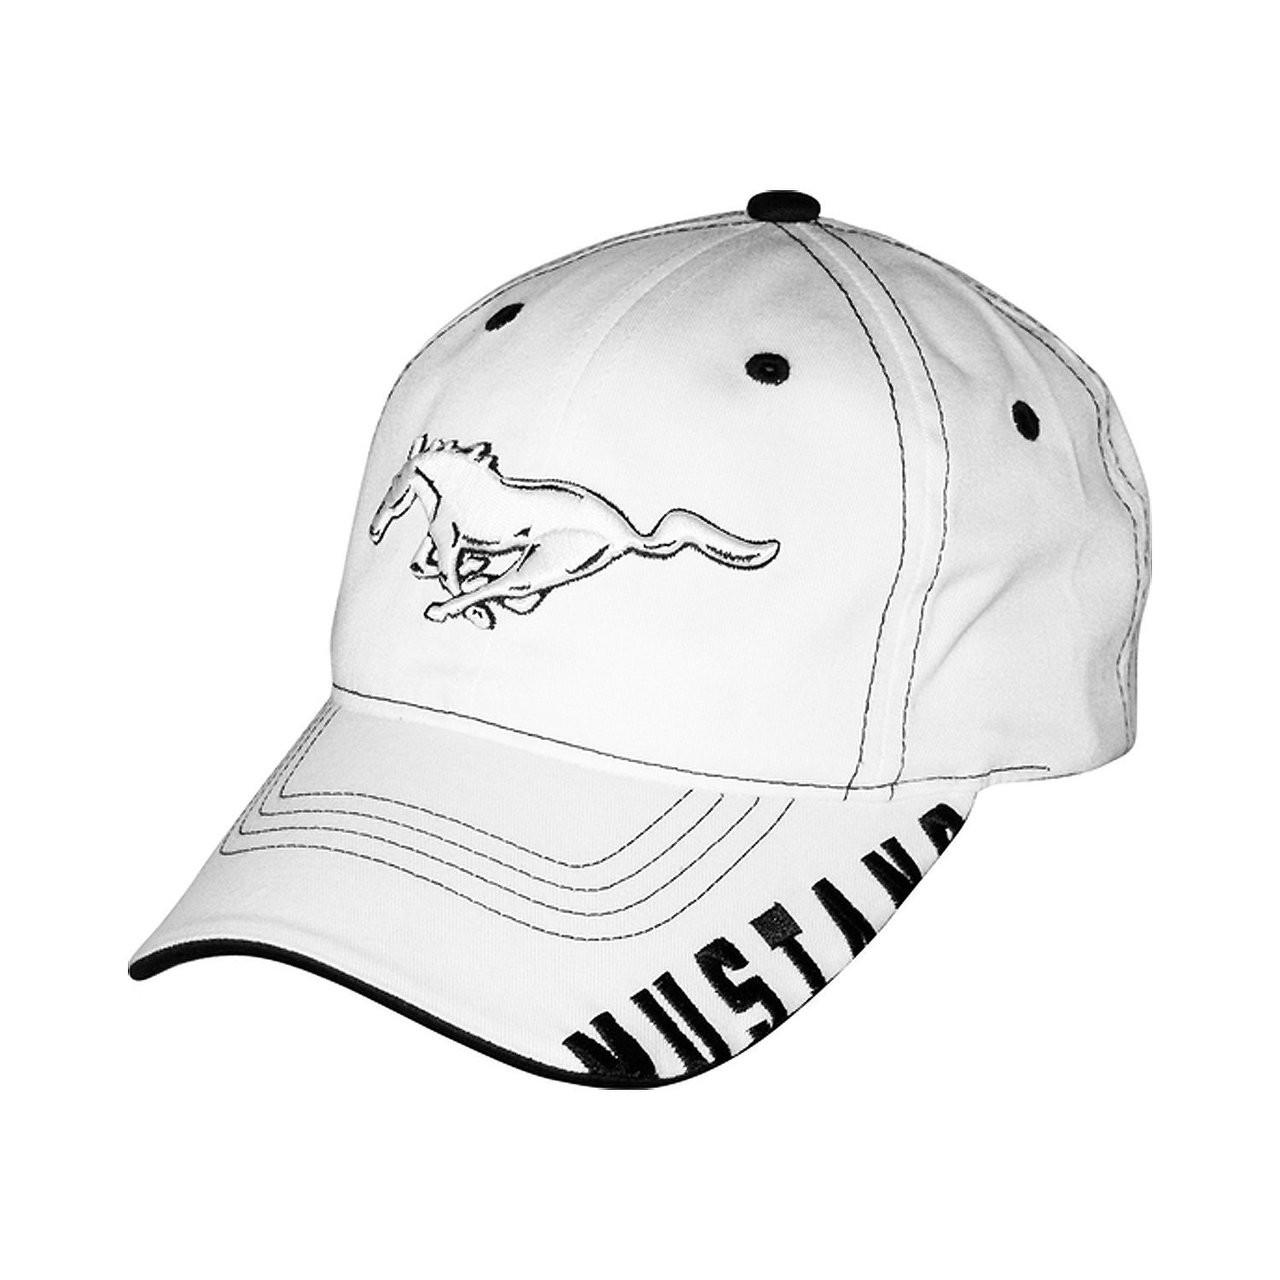 20937b883 Ford Mustang Bill Edge 3d Pony Baseball Cap